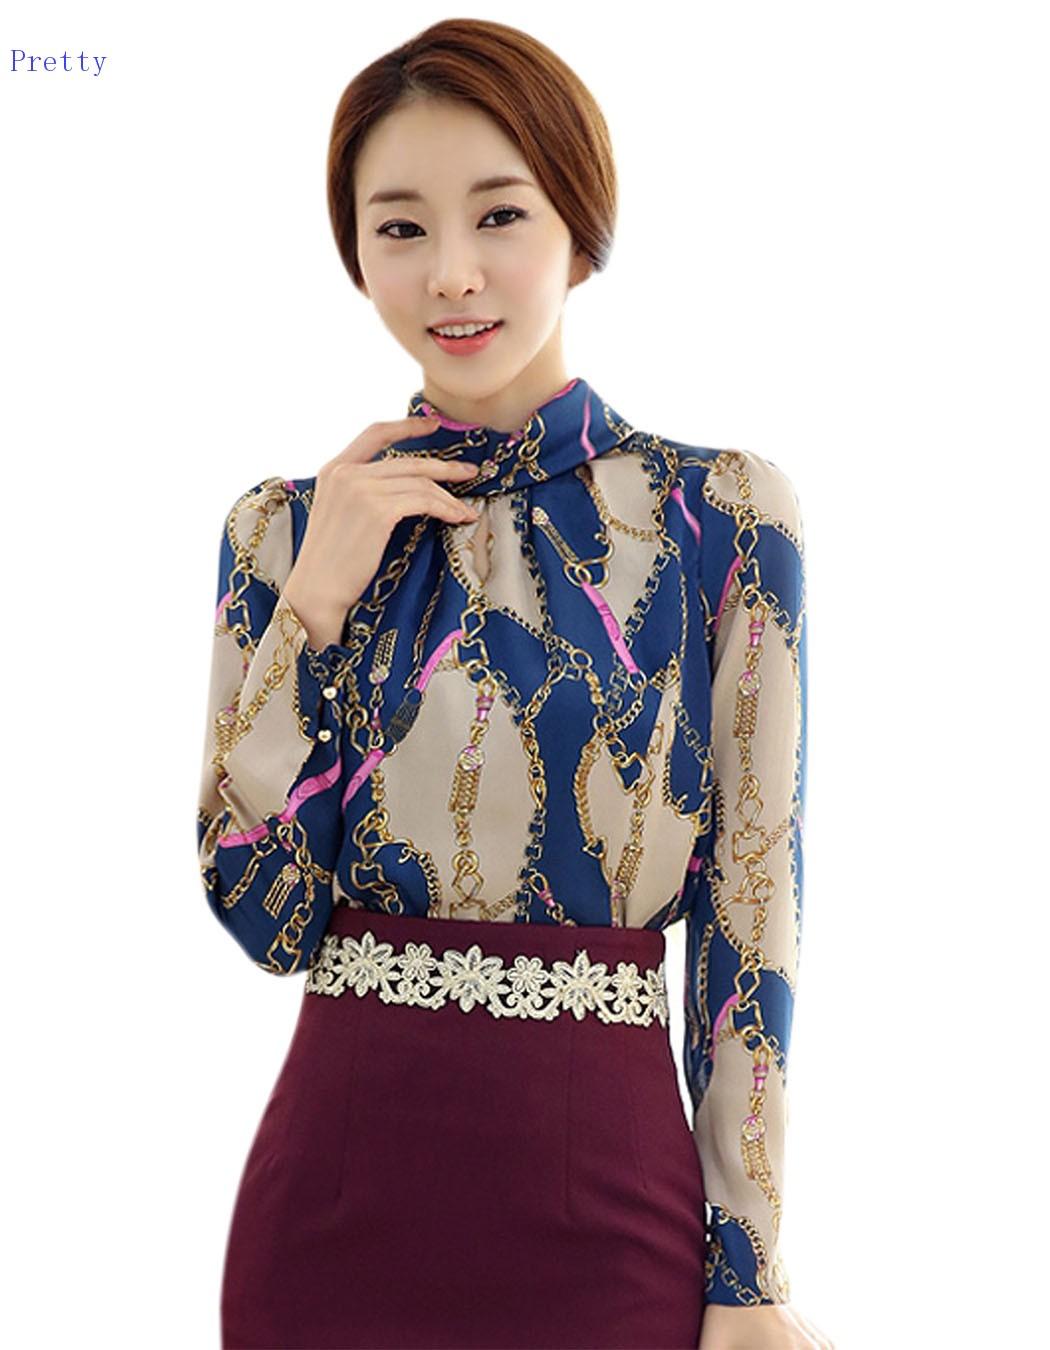 New Arrival 2015 Women Casual Summer Blouses Korean Fashion Vintage Long Sleeve Sheer Tops ...